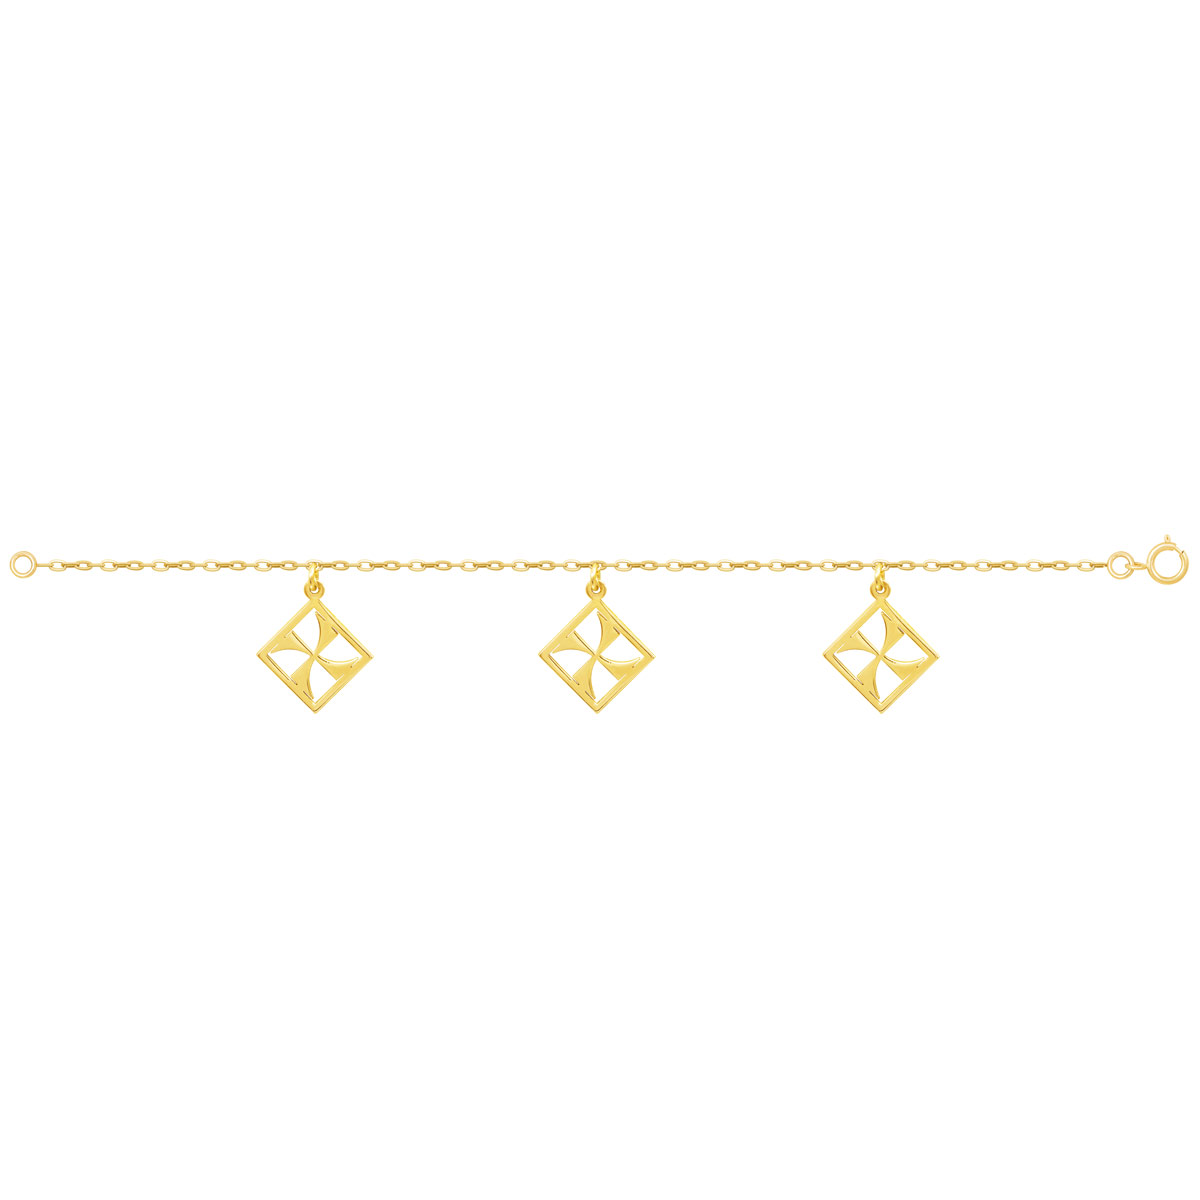 دستبند طلا مهر پرسته